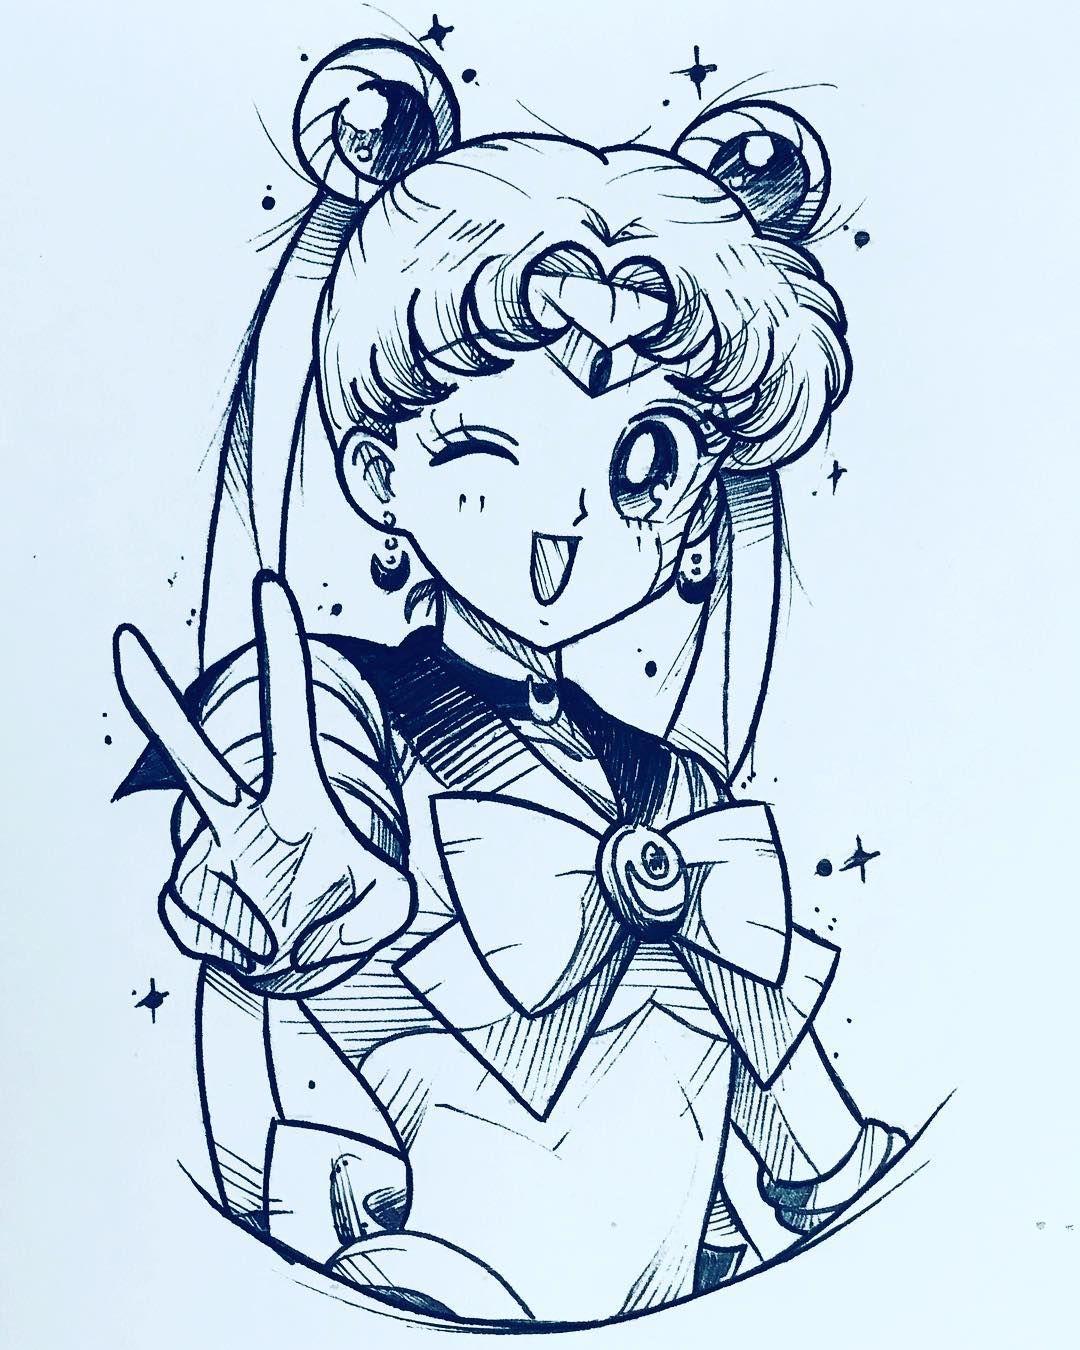 Insta Desenh0 Arts Sailor Moon Tattoo Sailor Moon Art Sailor Moon Wallpaper